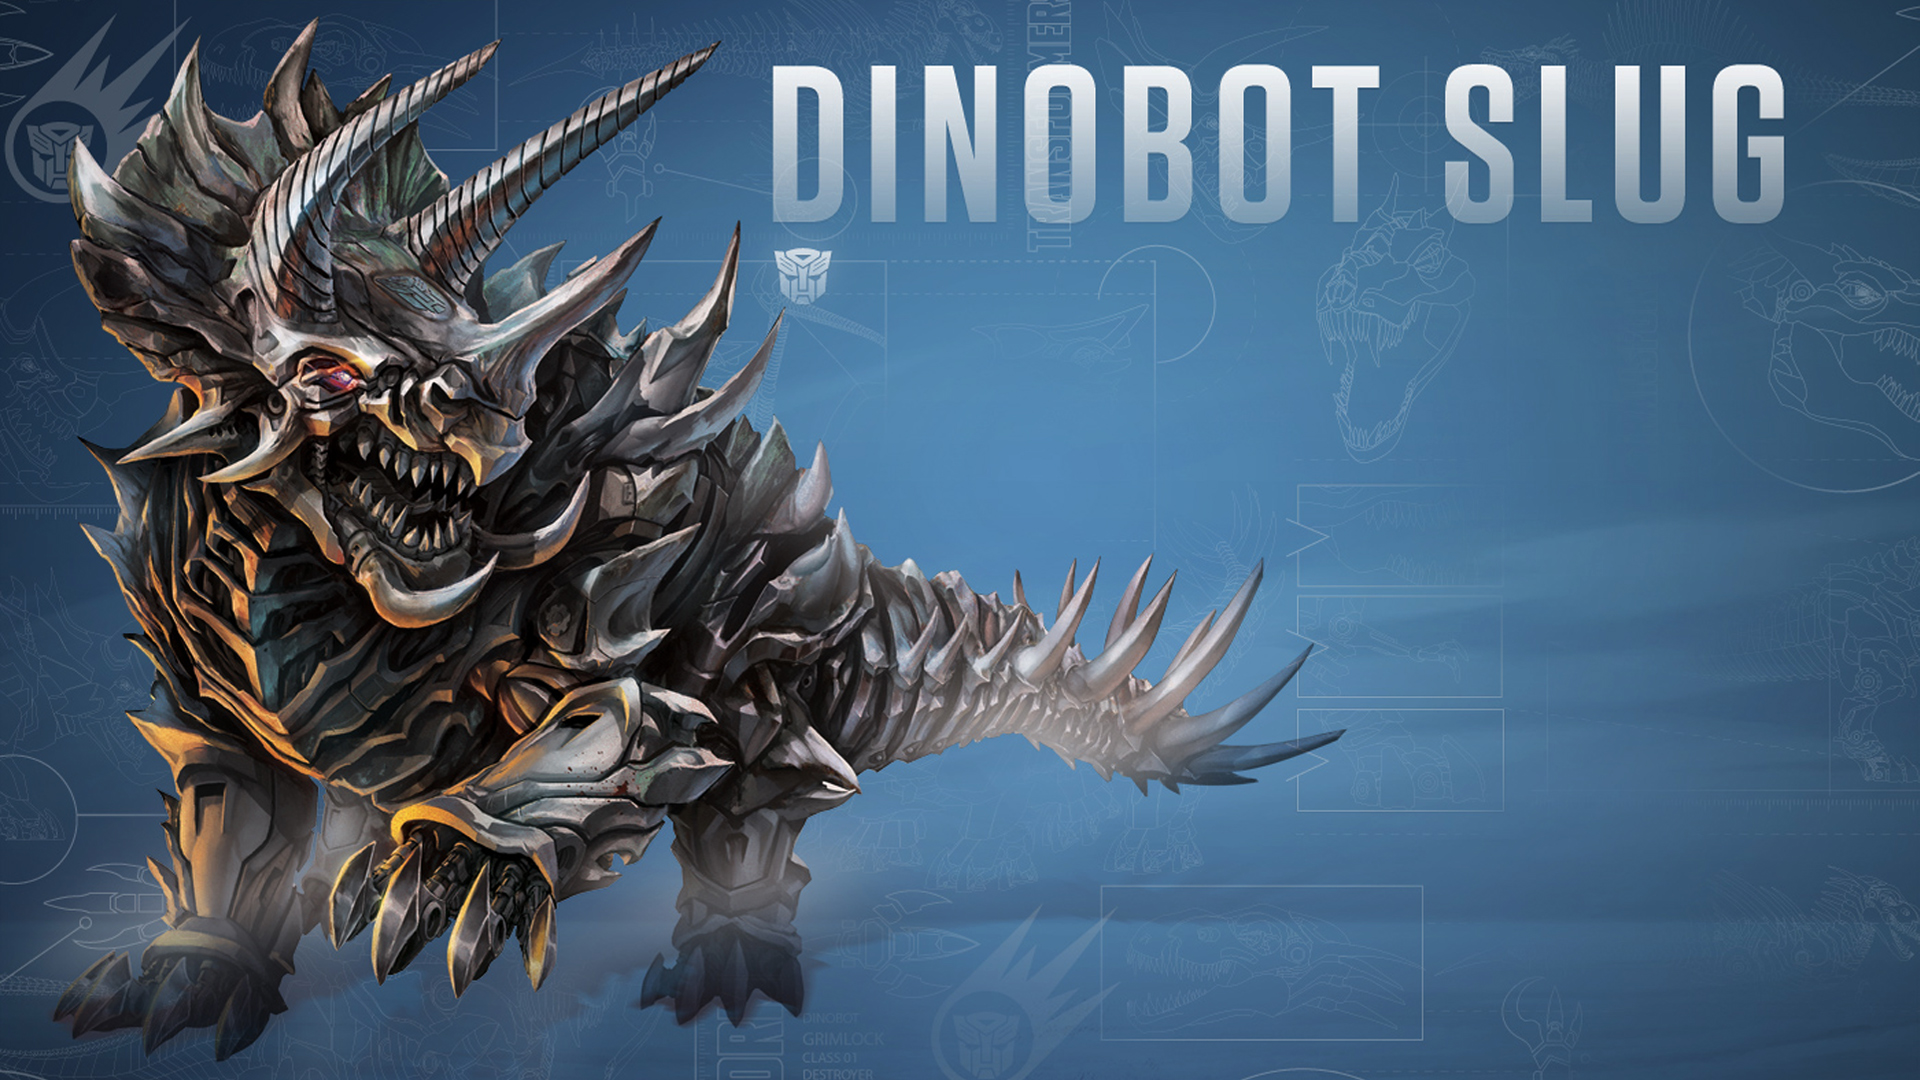 slug dinobot transformers 4 hd wallpaper